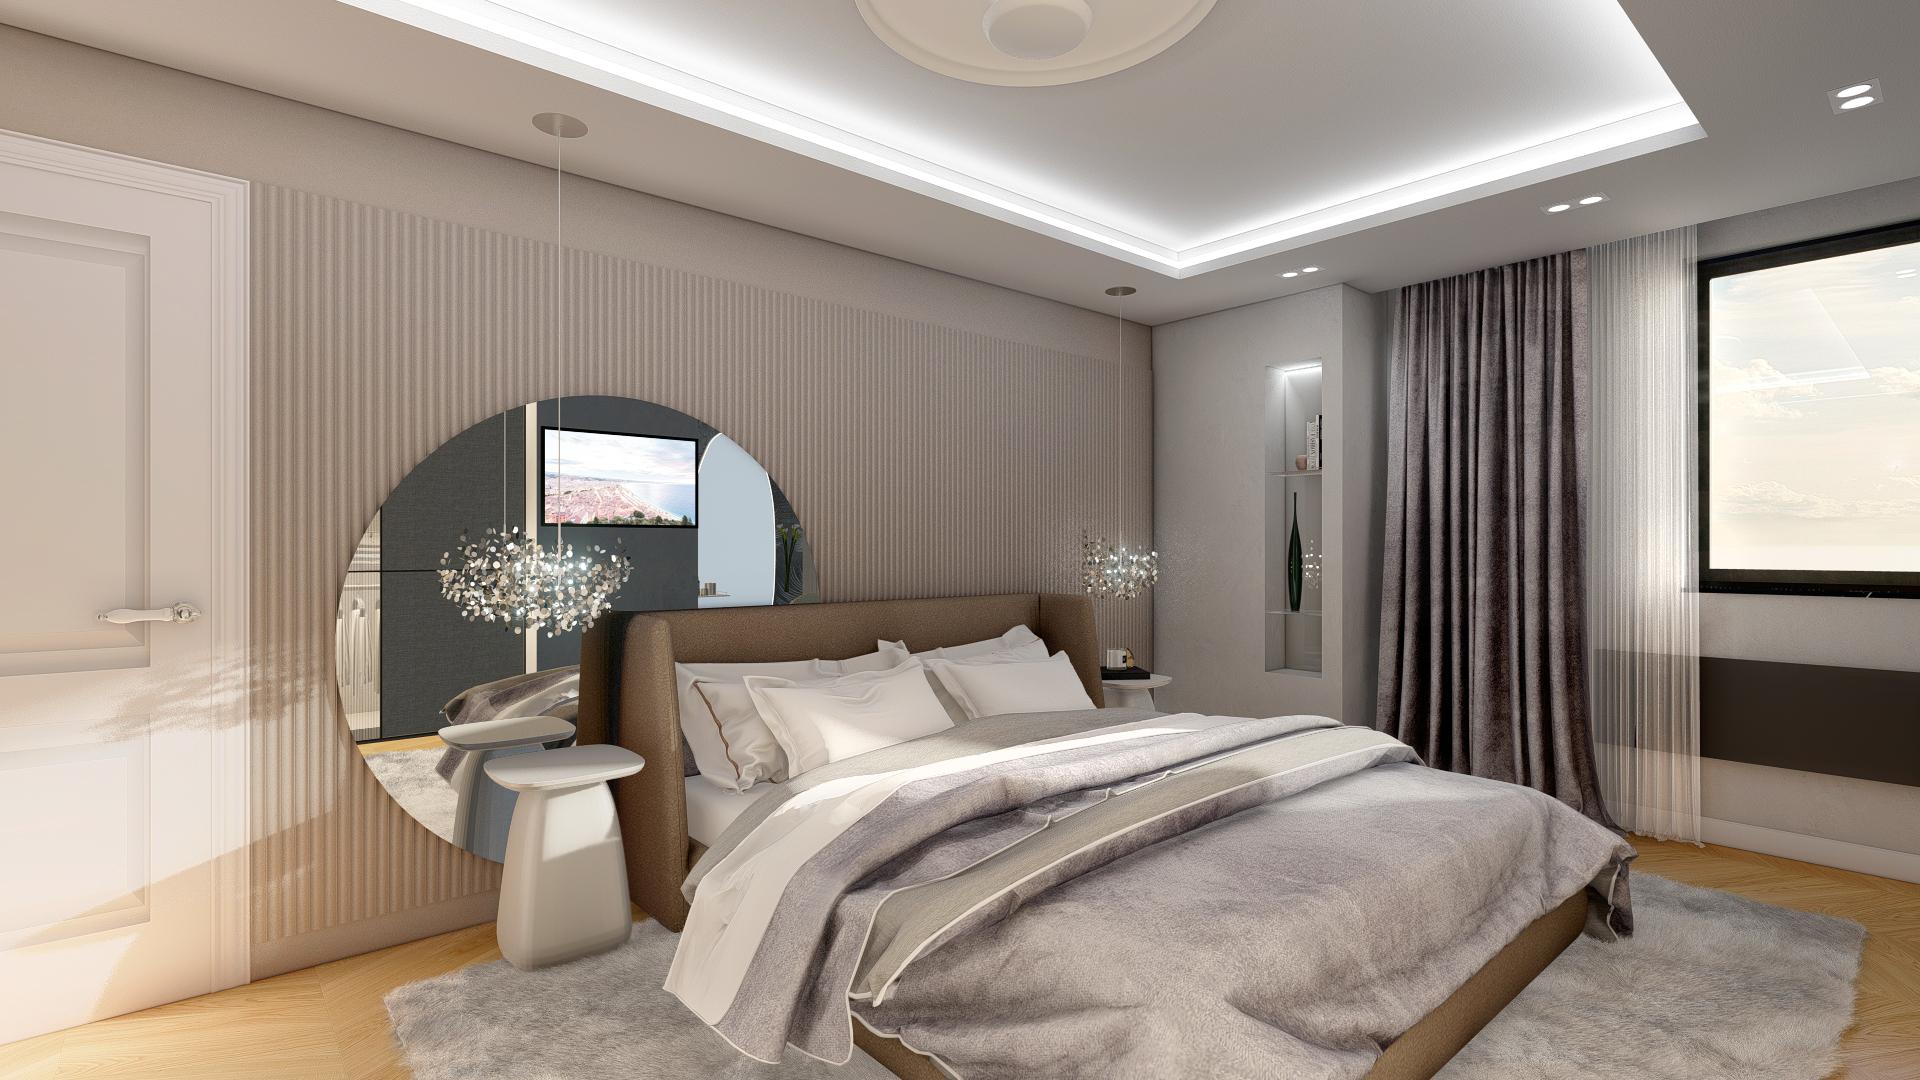 dormitor1_1 – Photo